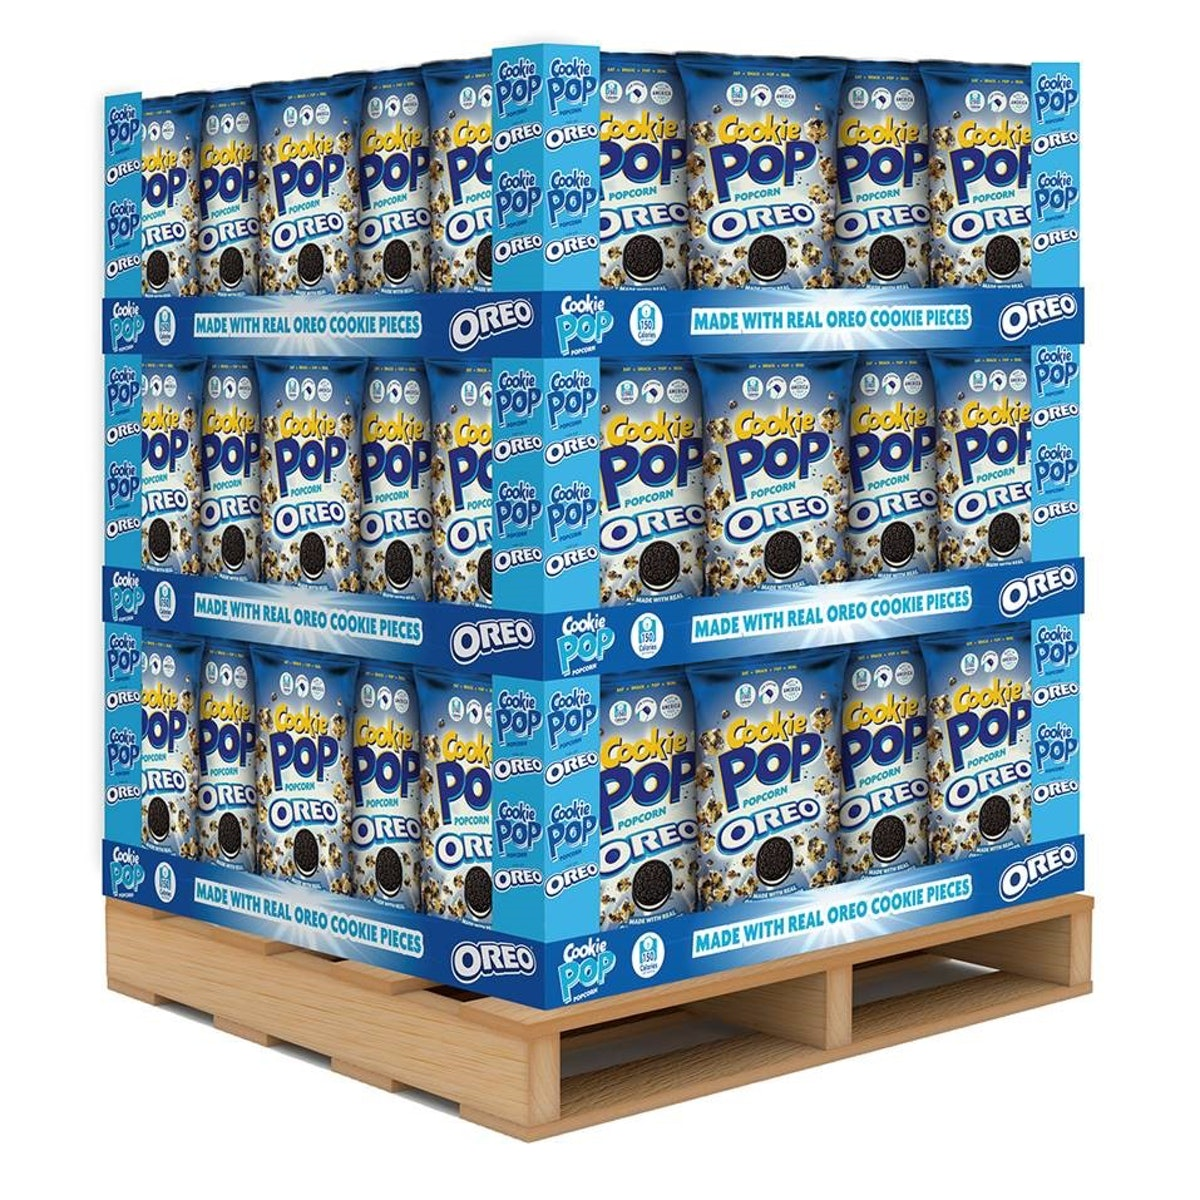 Sam's Club is selling Oreo-flavored popcorn starting on Jan. 21.